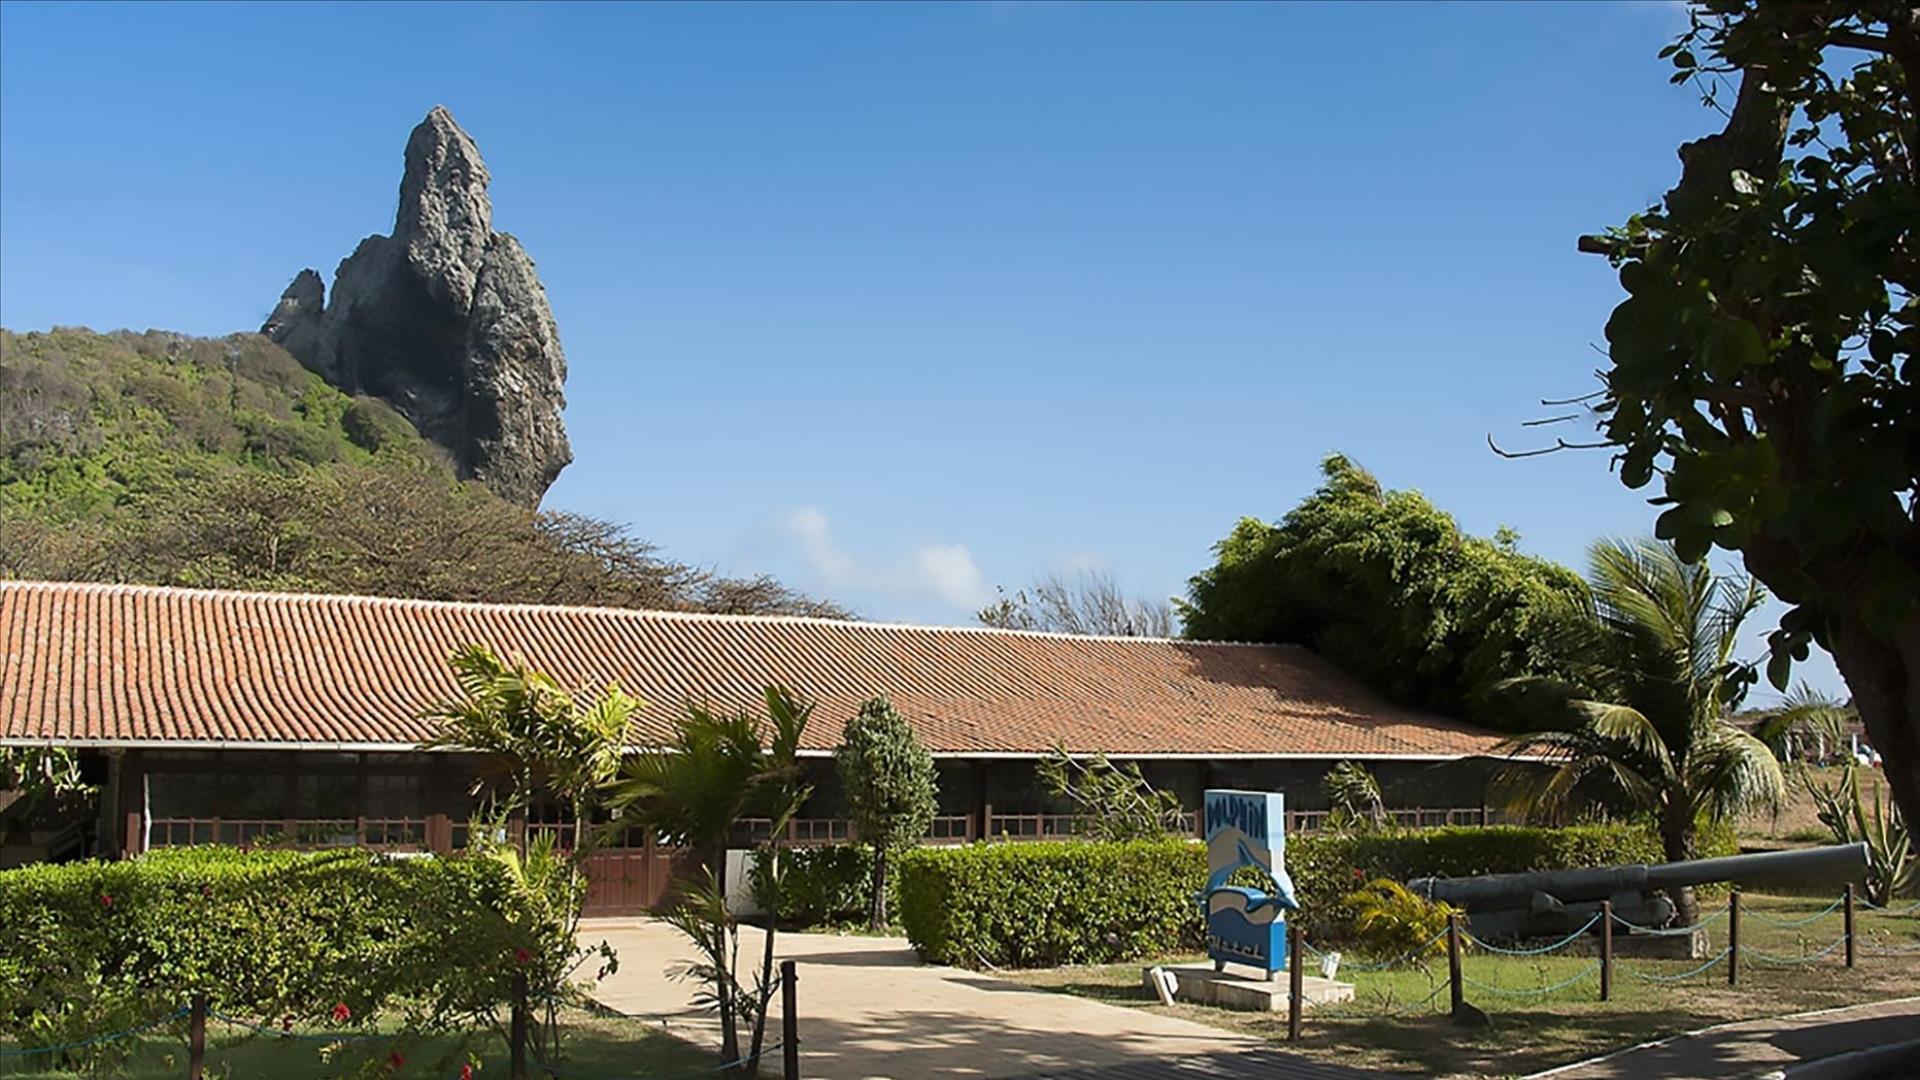 Brasilien Fernando de Noronha: Standard Hotel - Hotel Dolphin